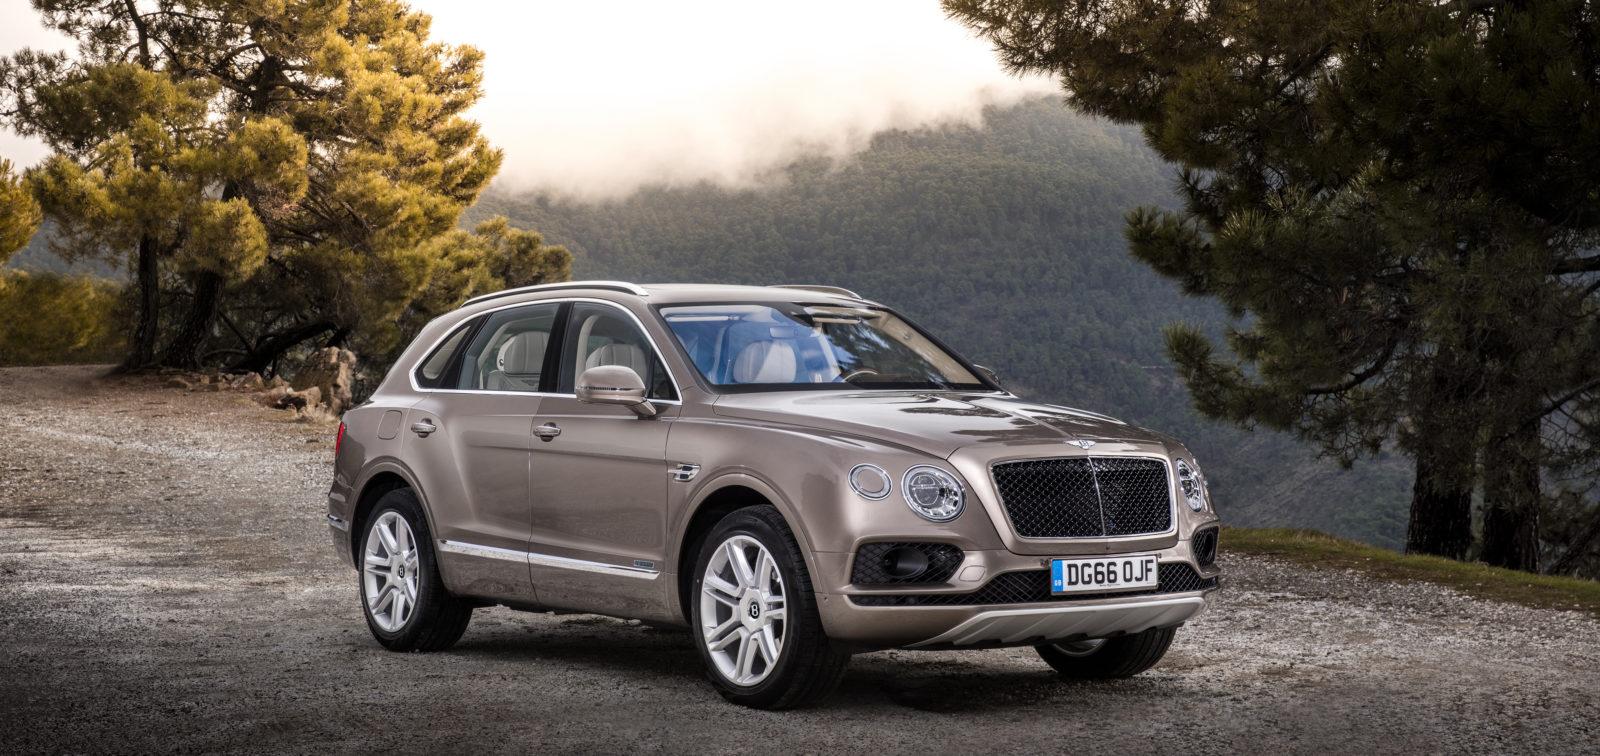 Bentley Bentayga Diesel King Of The Road